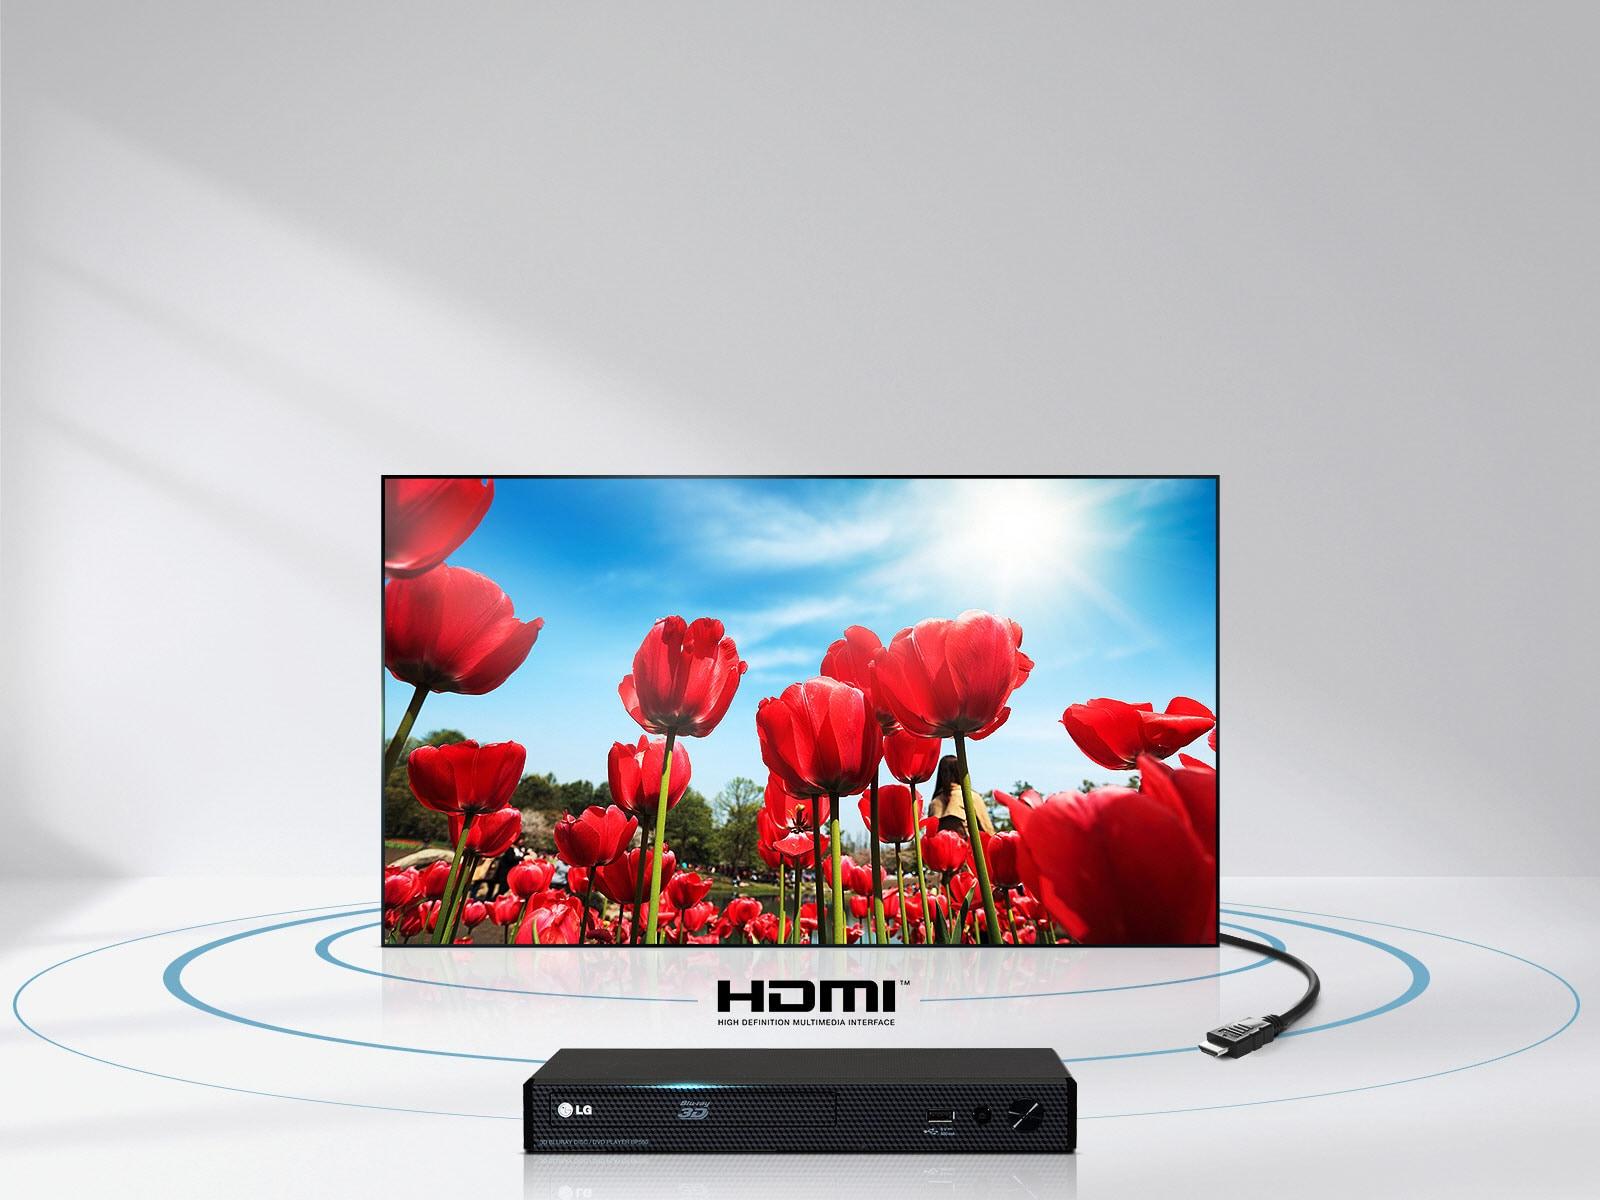 06_49_43LJ51_D_HDMI-V1